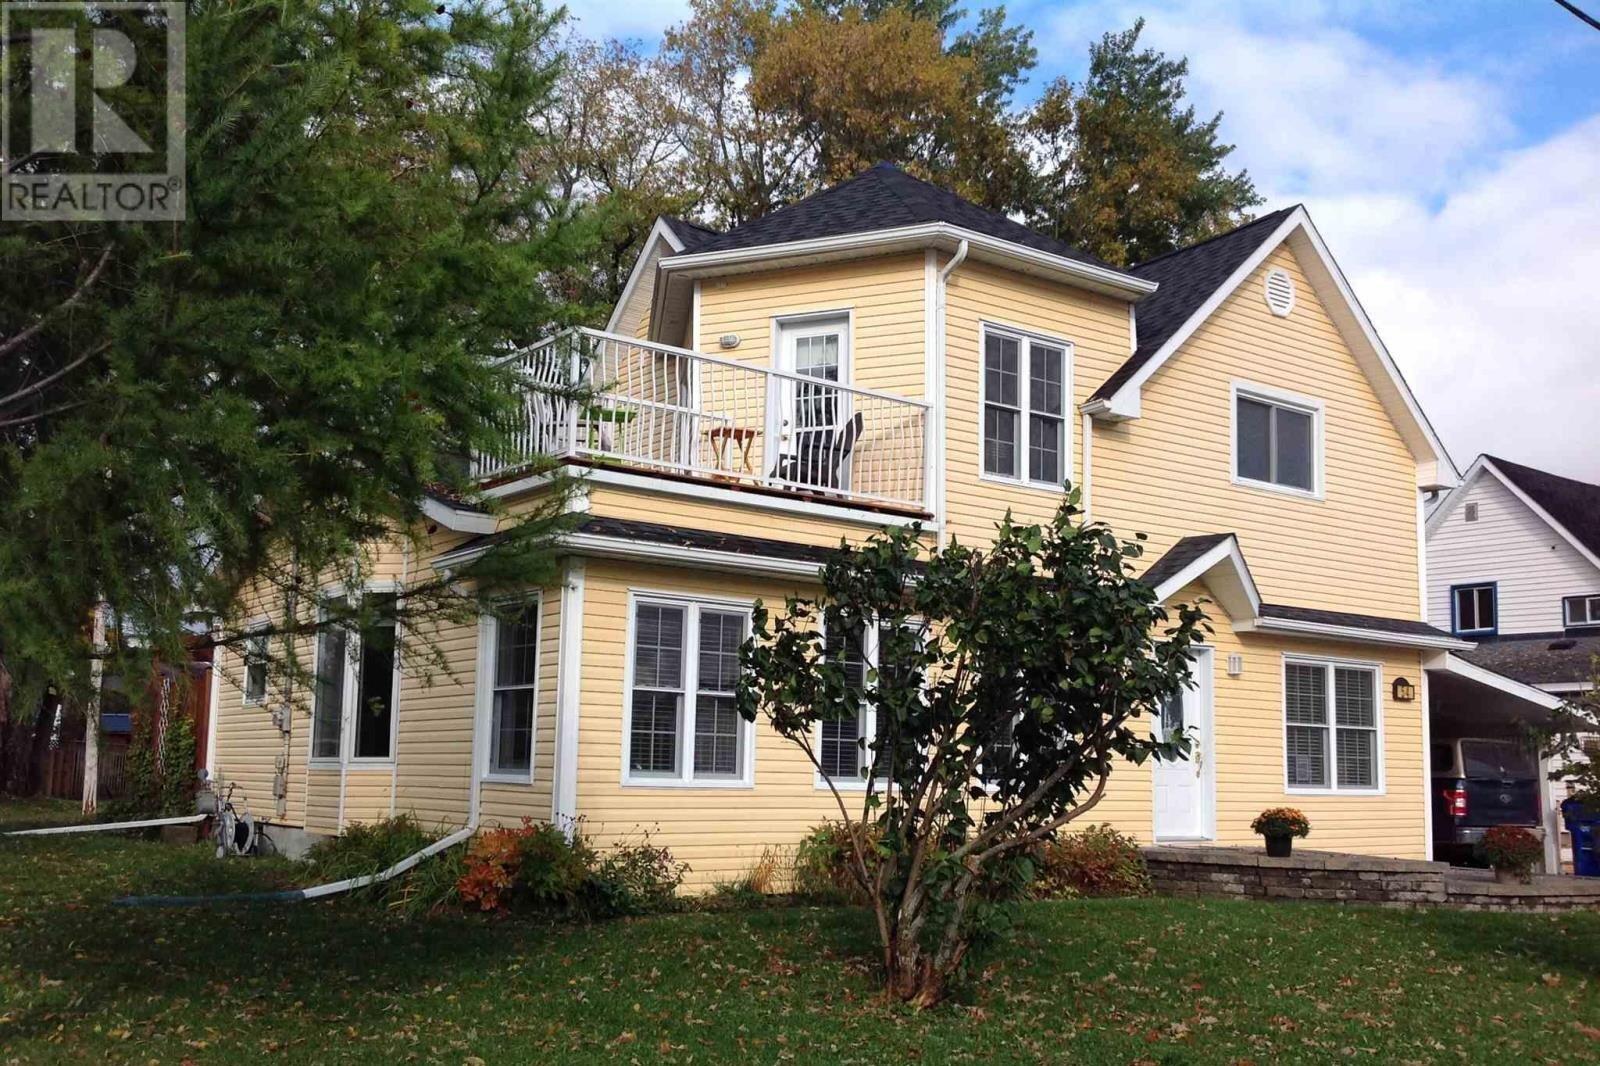 House for sale at 54 Katherine St Temiskaming Shores Ontario - MLS: TM202003